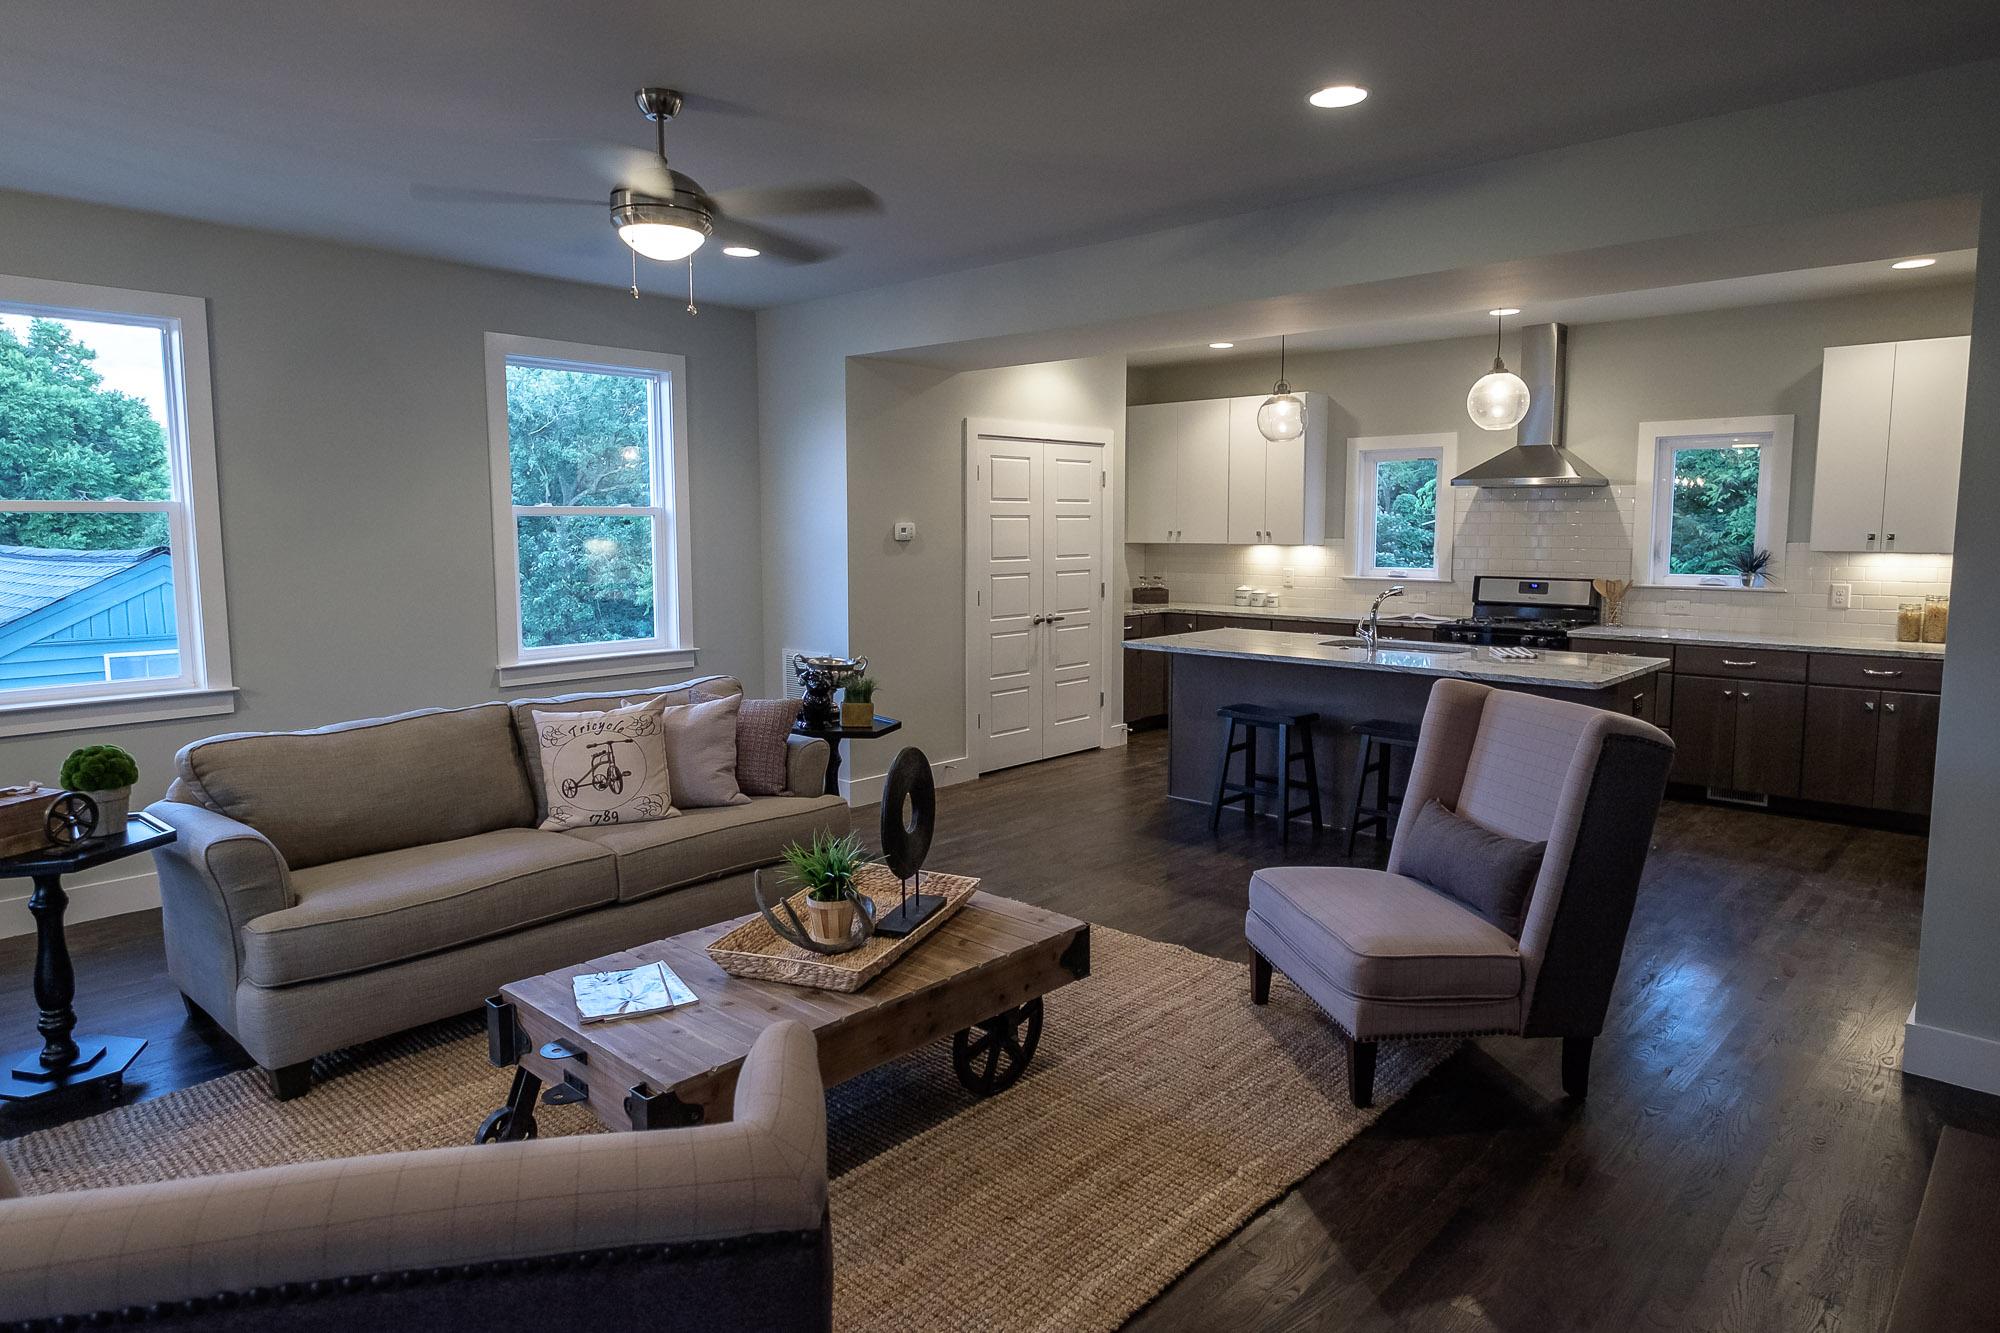 House-Plans-Online-Duplex-Nashville-Peggy-Newman-Living-Kitchen-Porter.jpg